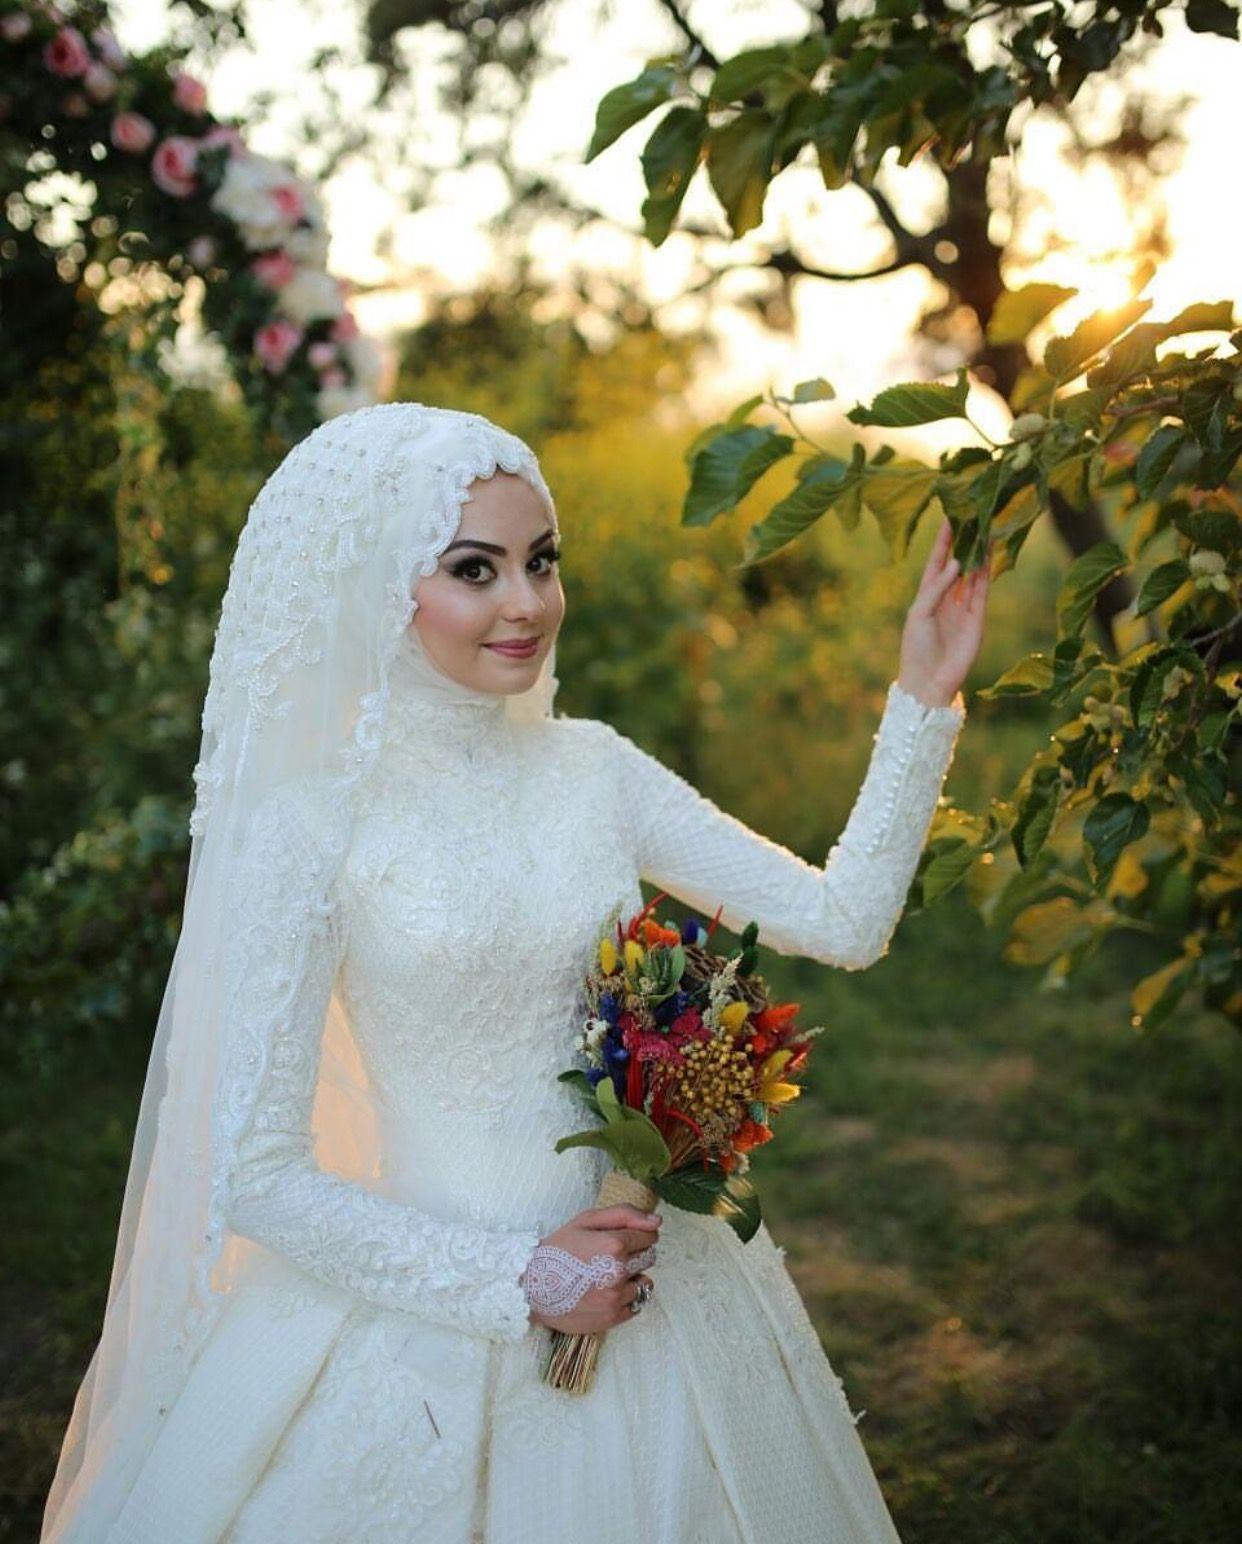 Pin by 🌸just4girls🌸 on Muslimcouples | Pinterest | Wedding dress ...